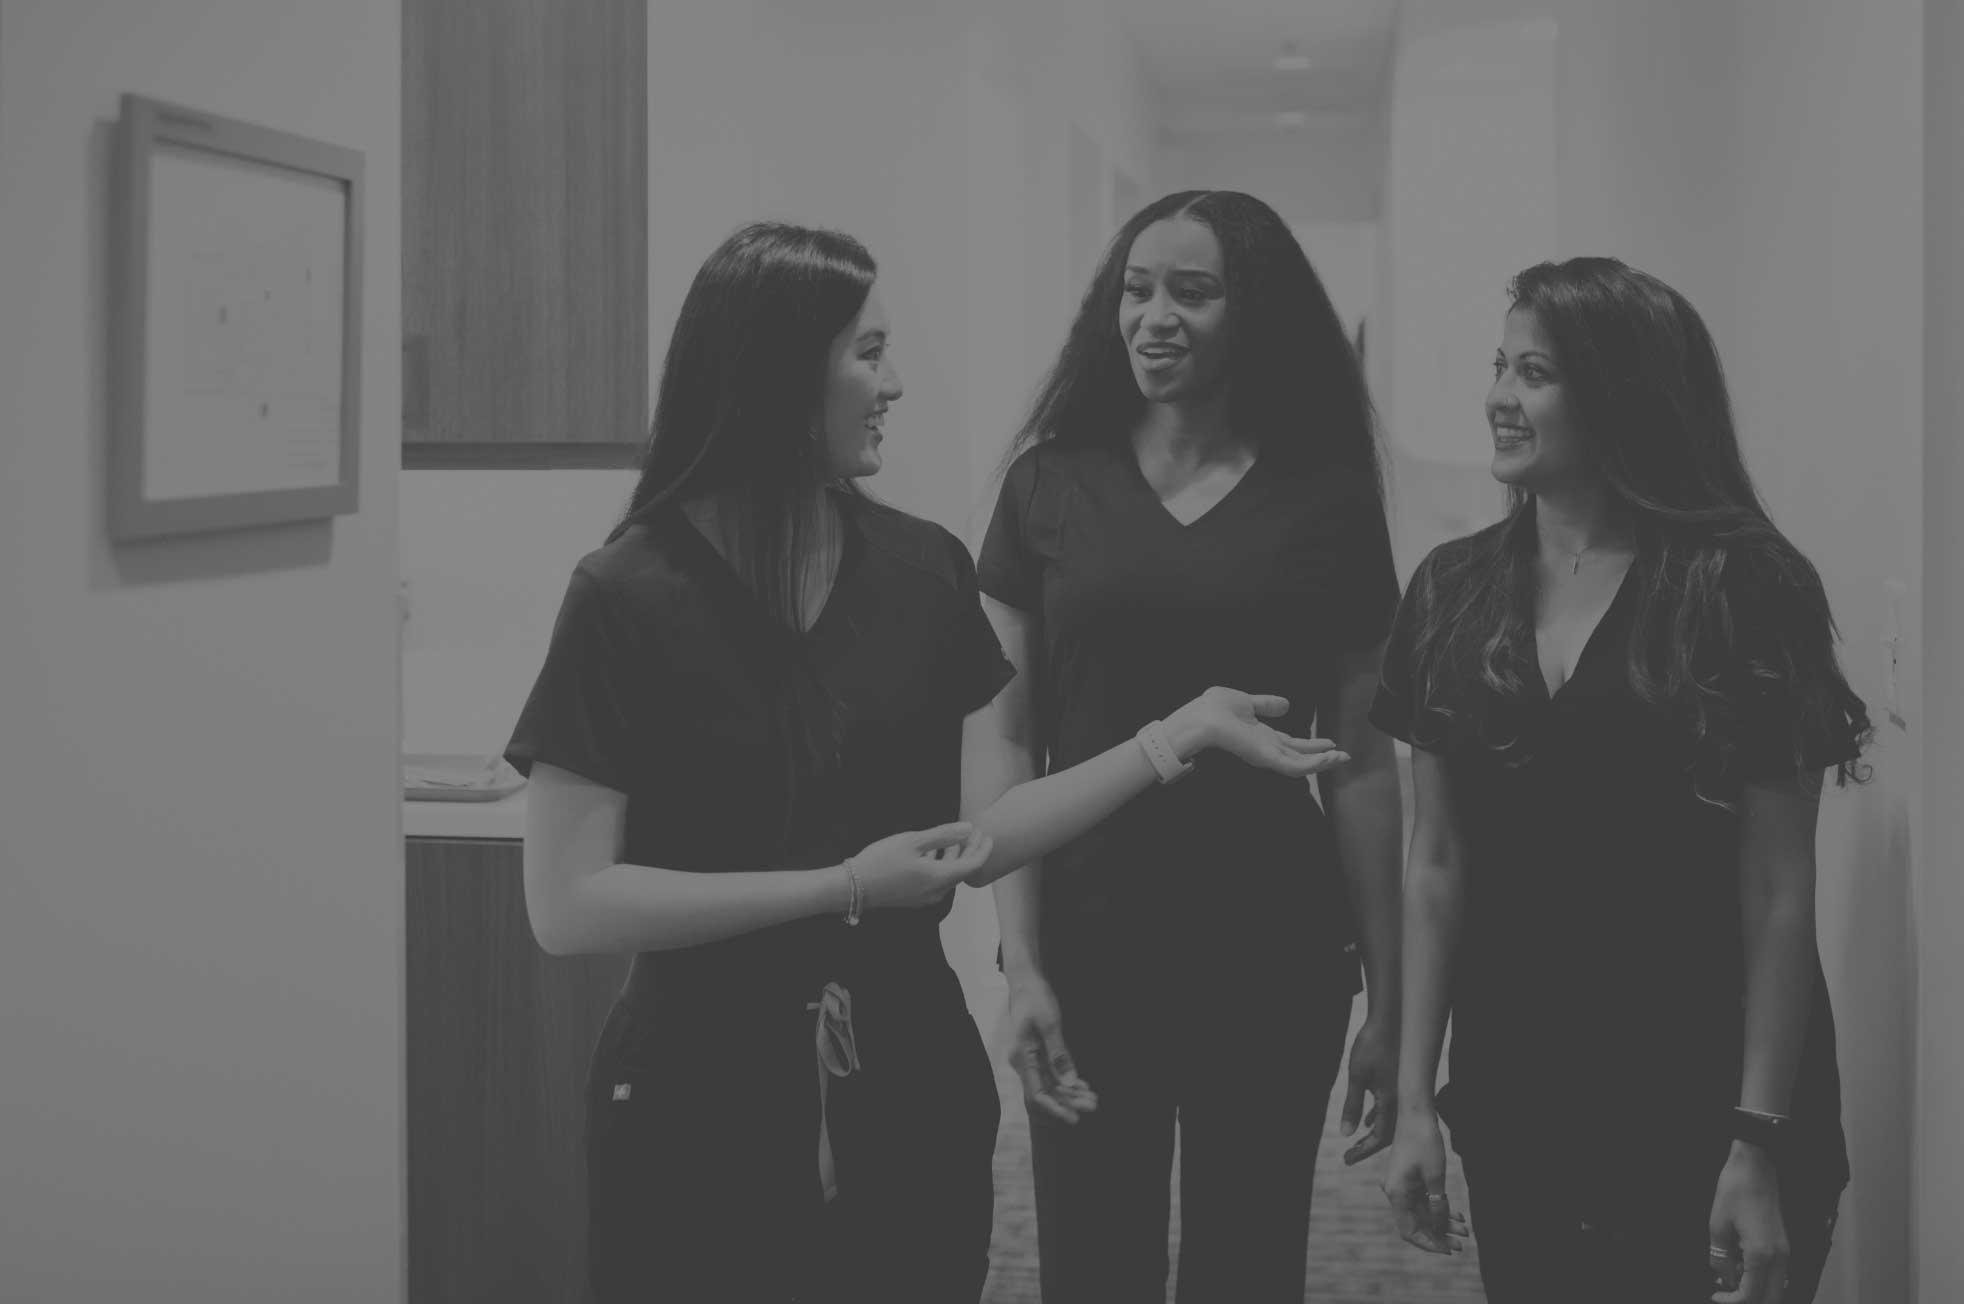 Photo of three dental team members talking in a hallway